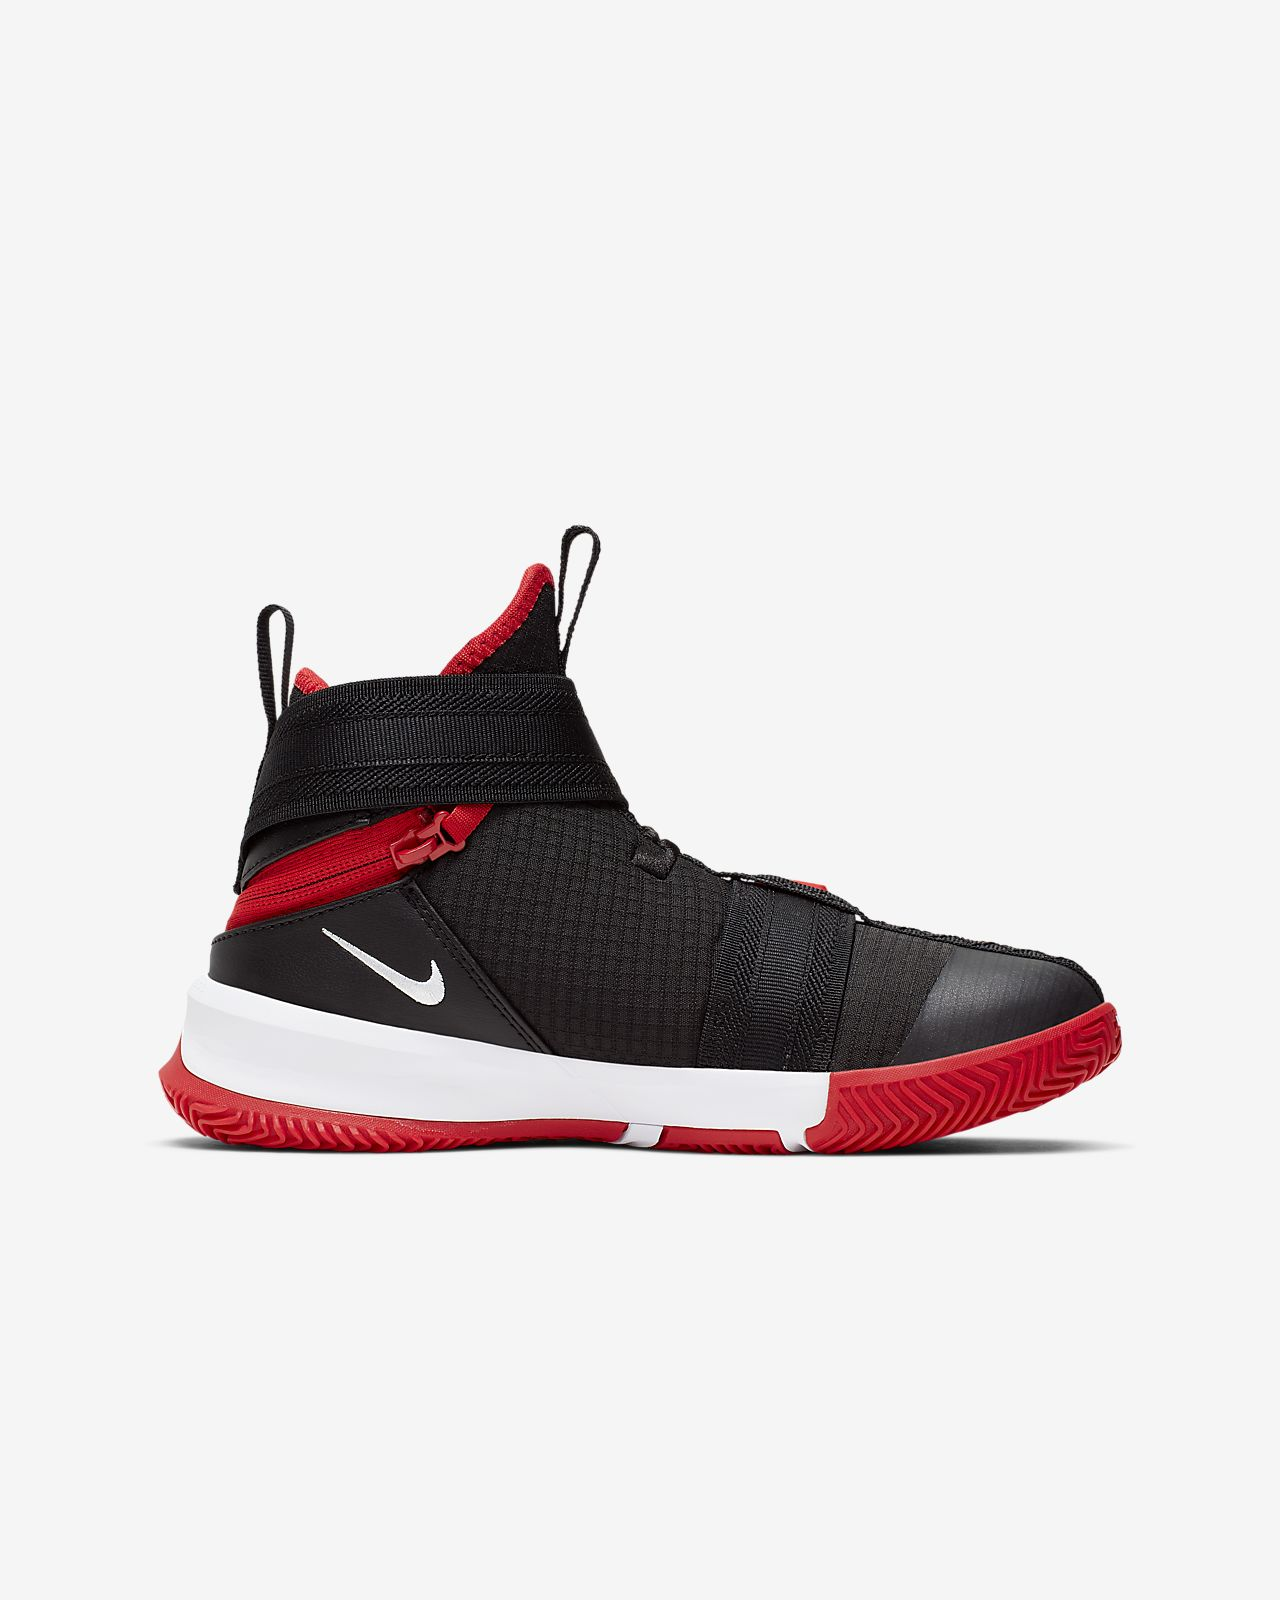 reputable site fa353 02eee LeBron Soldier 13 FlyEase Big Kids' Basketball Shoe